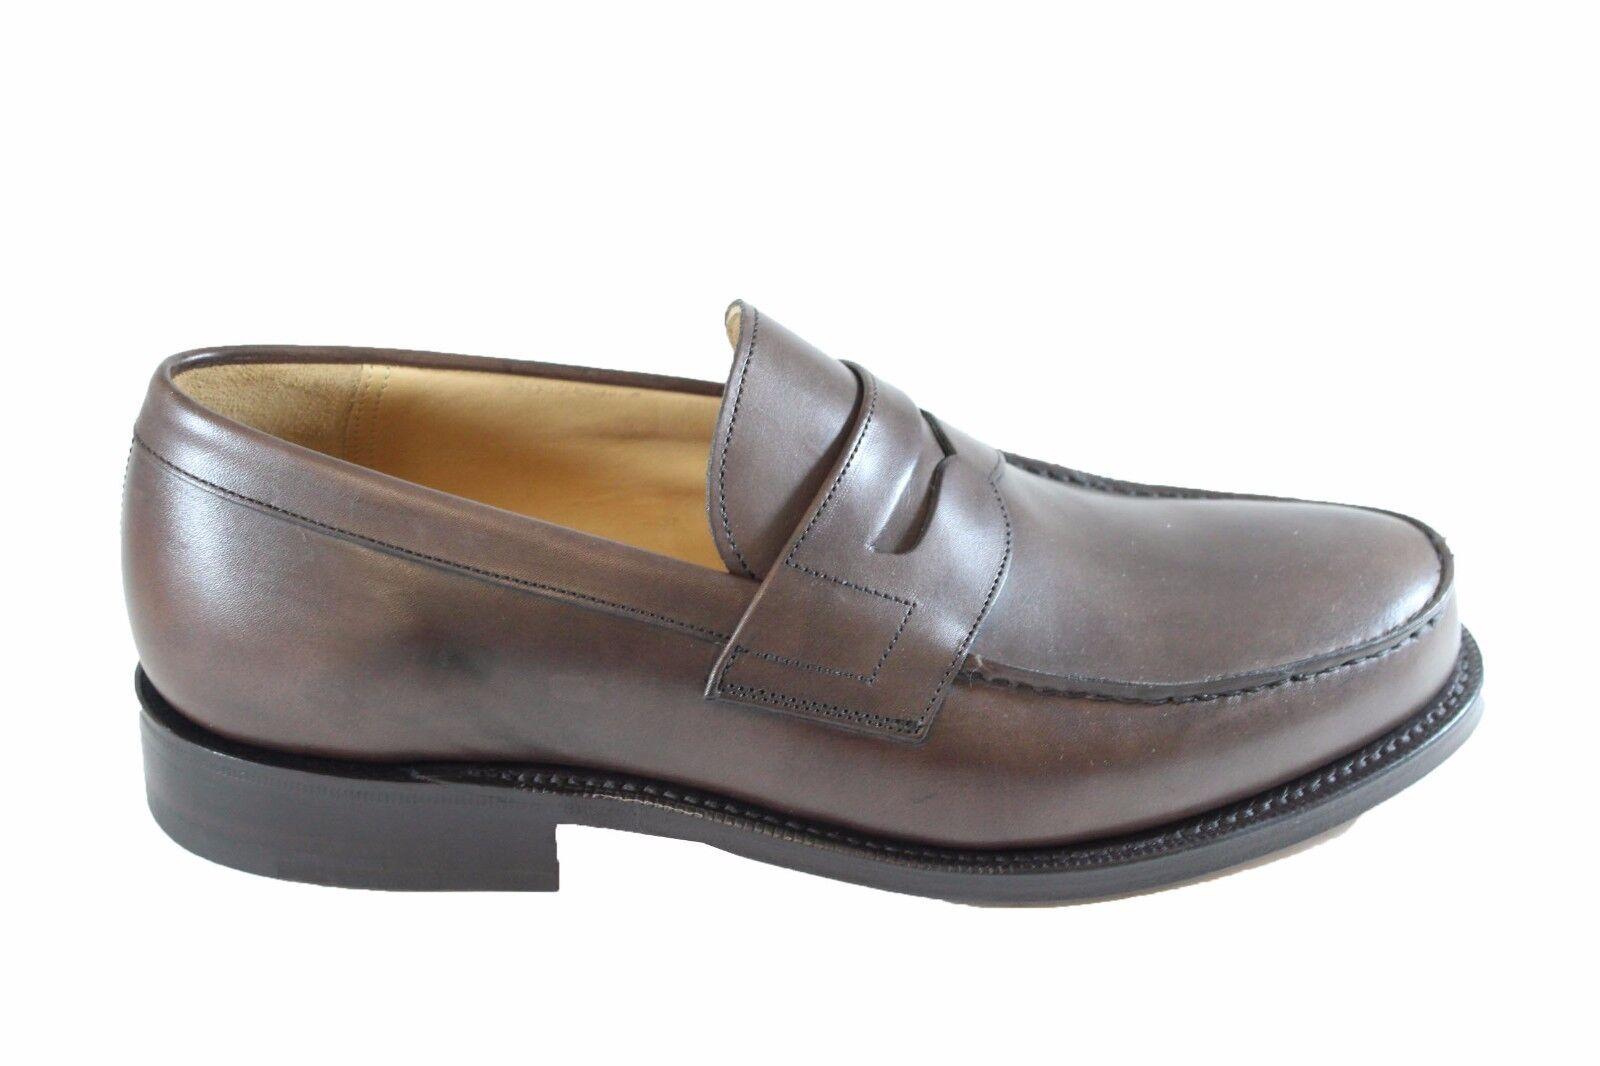 CHURCH'S Wesley Betis/Calf EXPRESSO loafers vitello , mocassino in vitello loafers 9d2f15